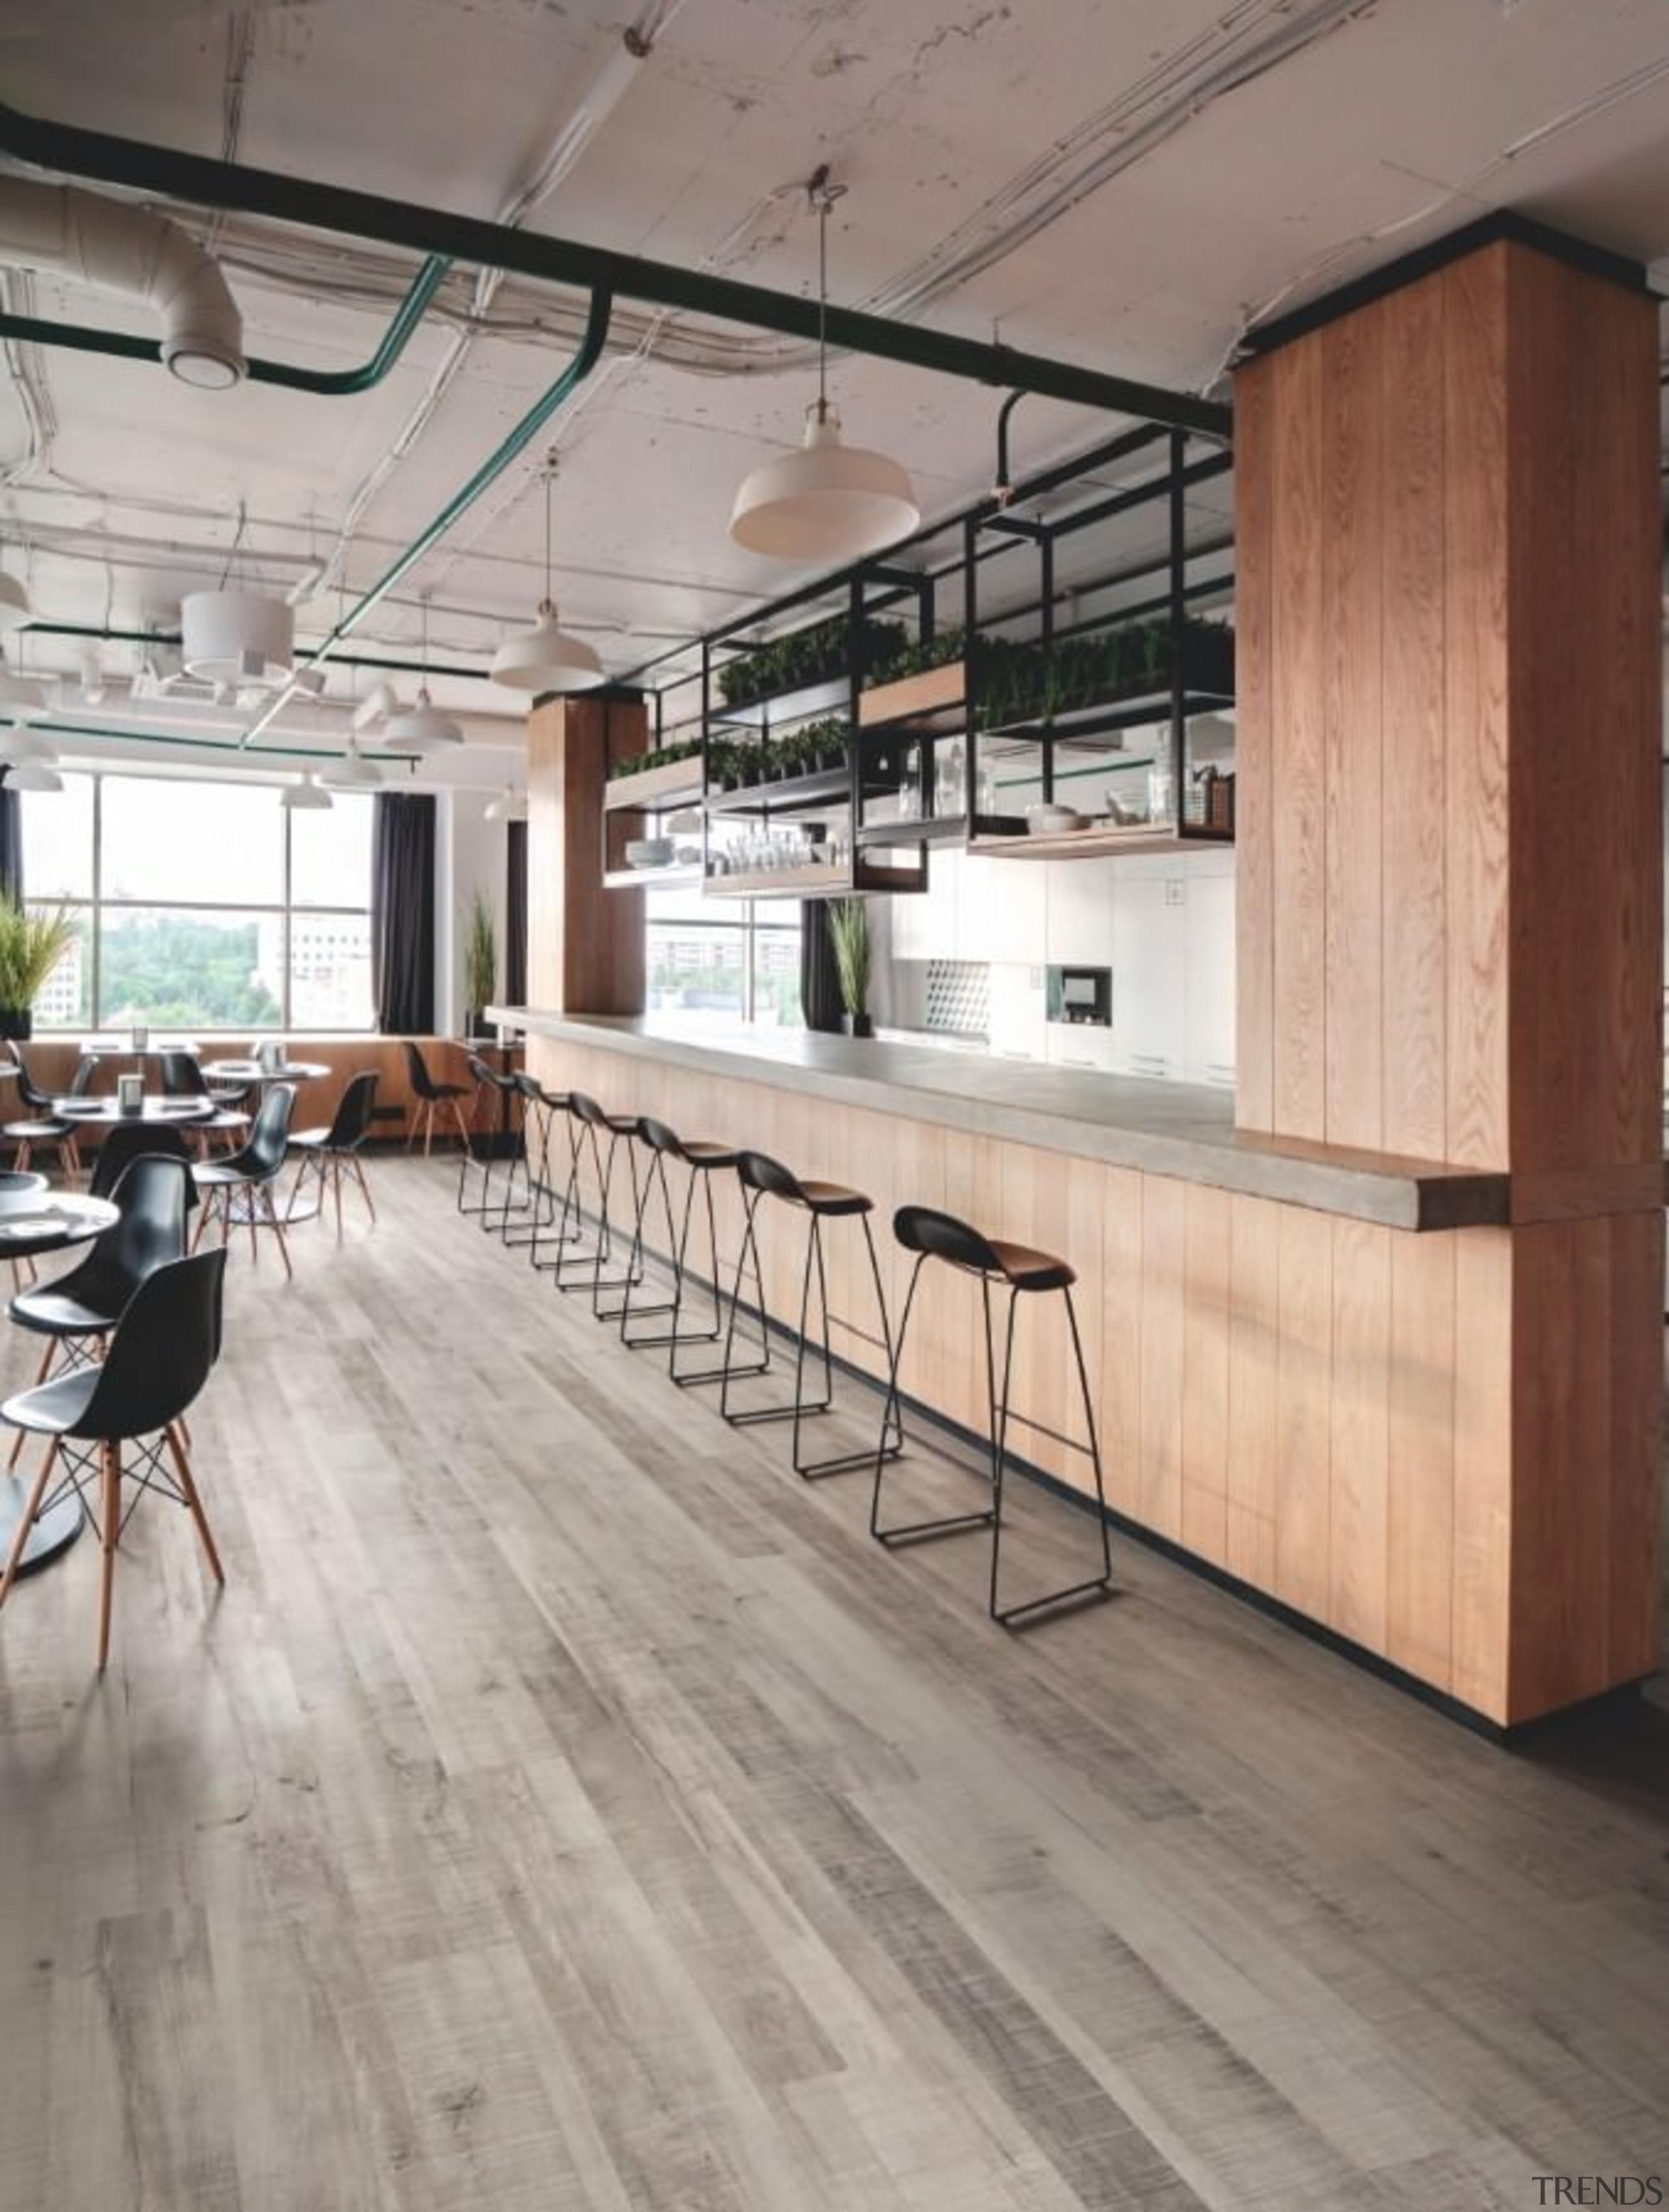 Expona is not just a byword for flooring floor, flooring, furniture, hardwood, interior design, laminate flooring, loft, table, wood, wood flooring, gray